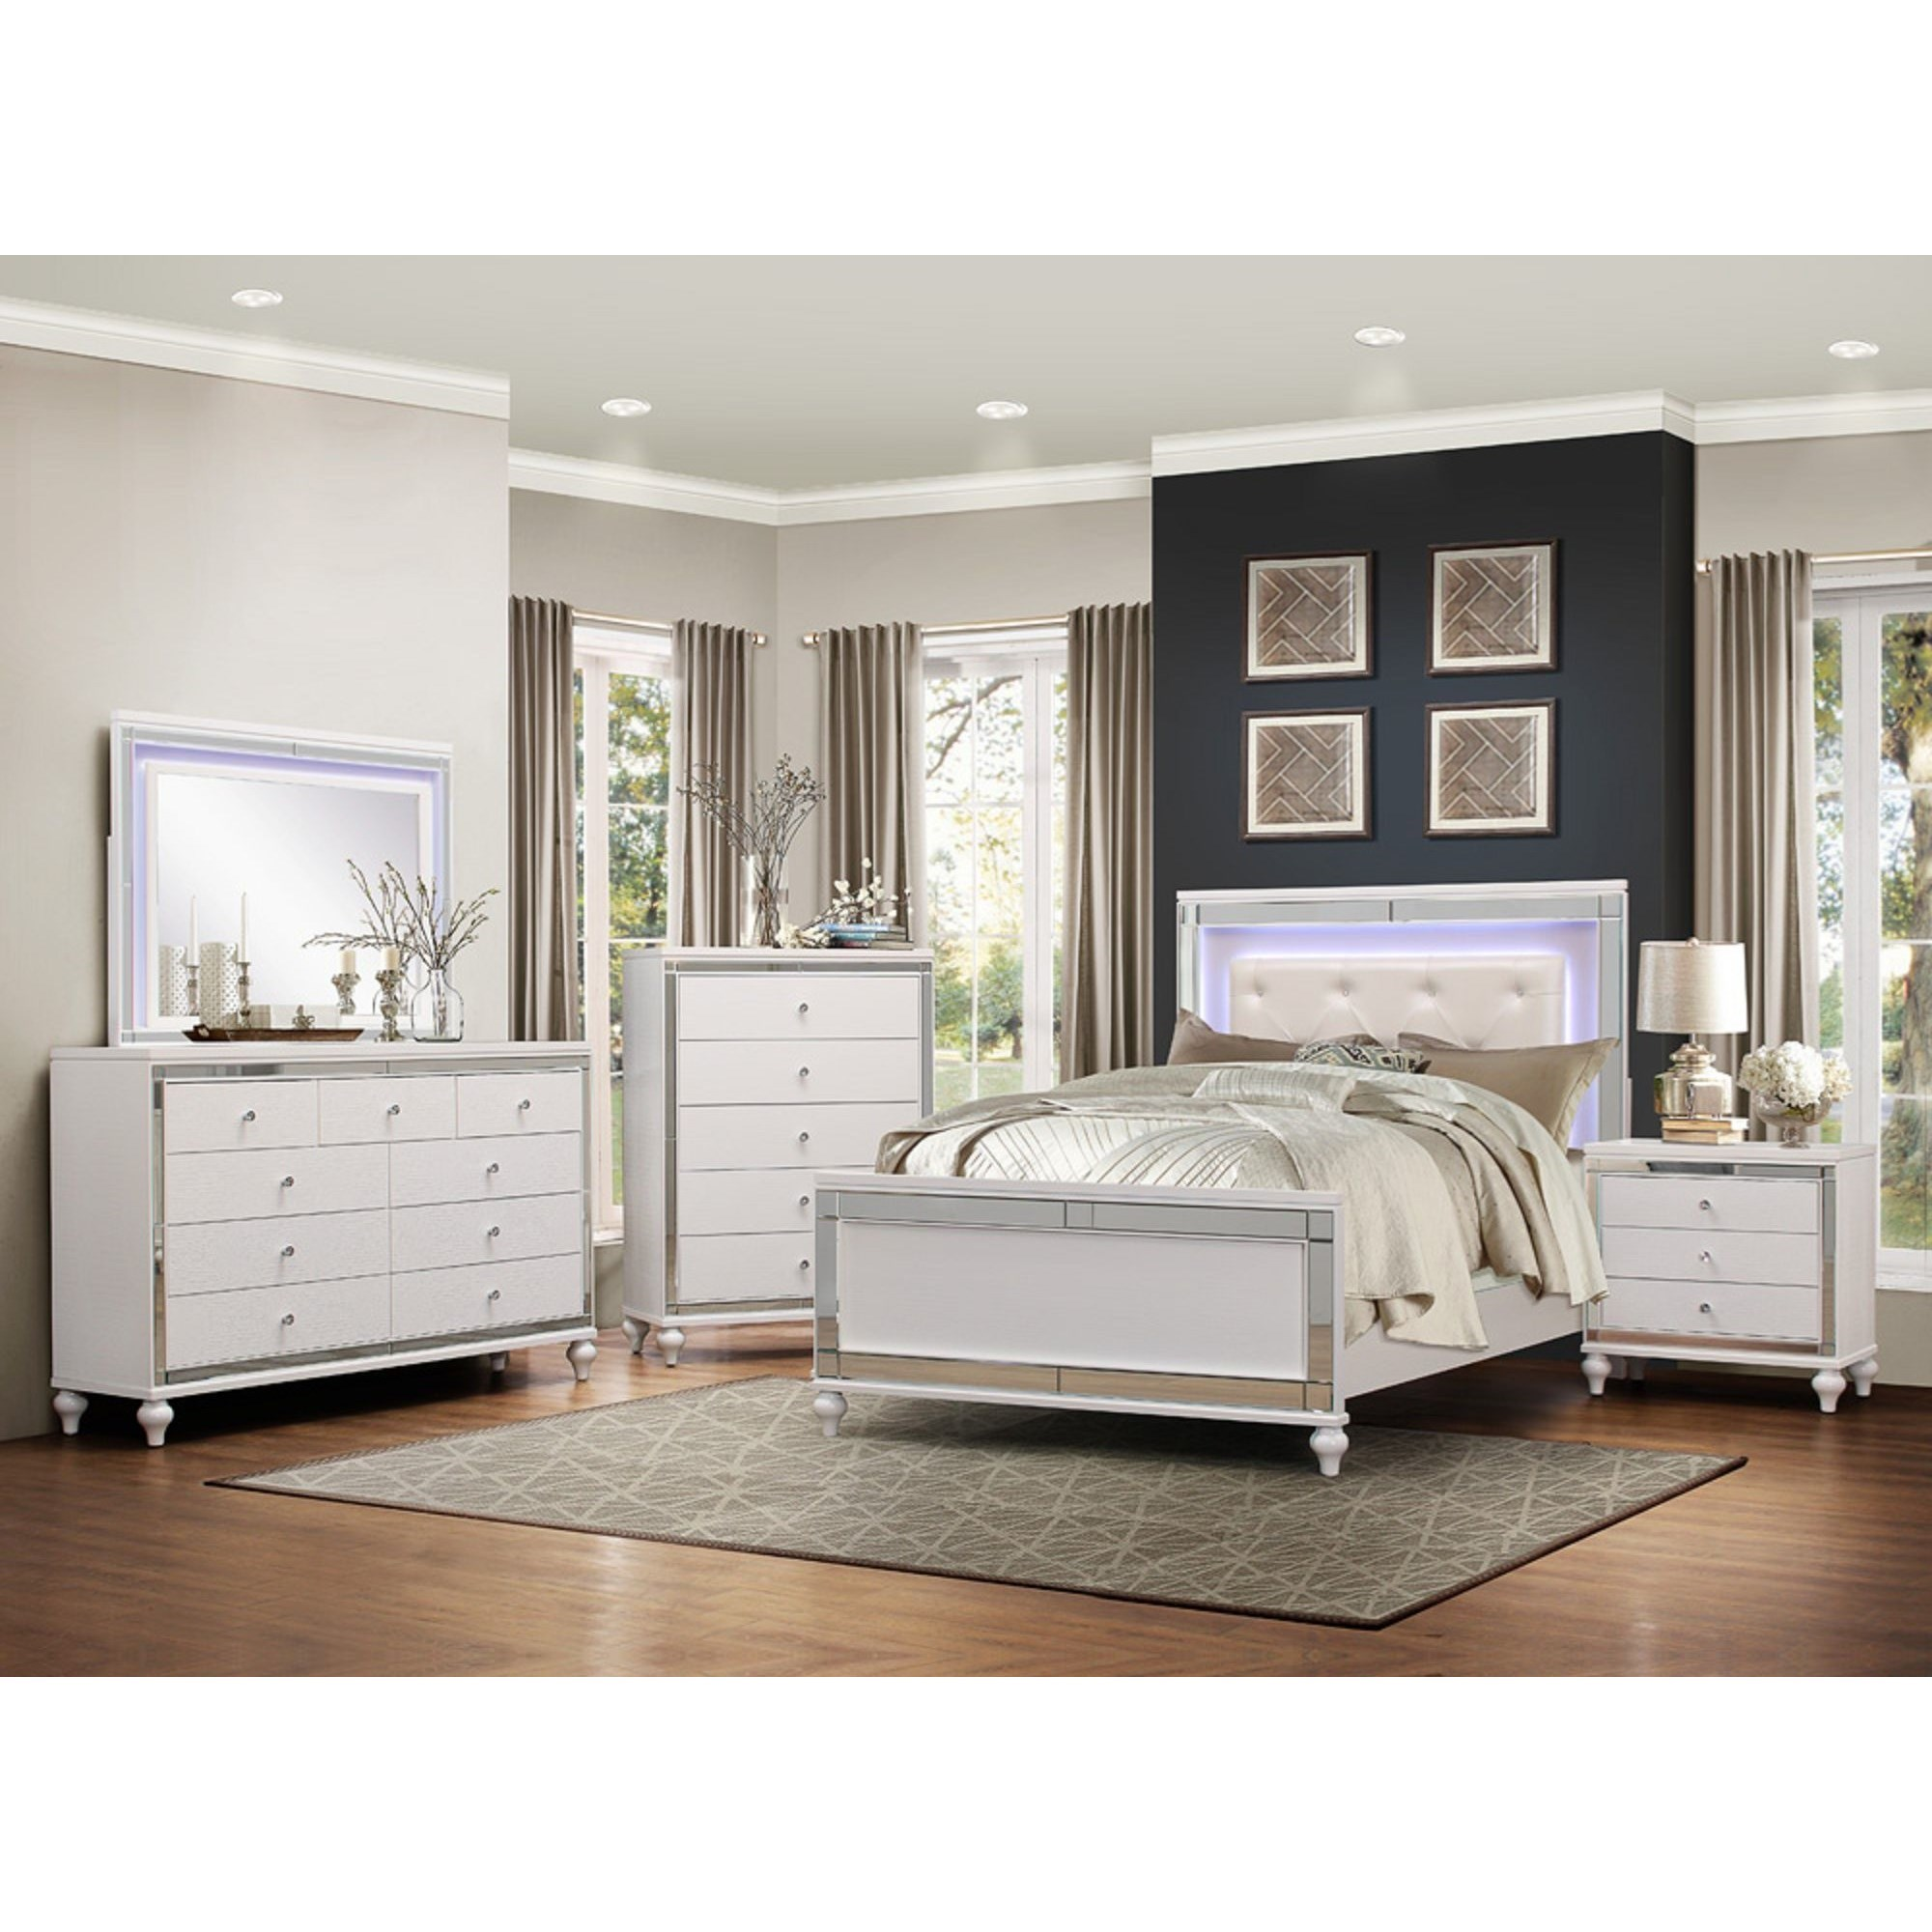 Alonza Cal King Lit Bedroom Group by Homelegance at Carolina Direct